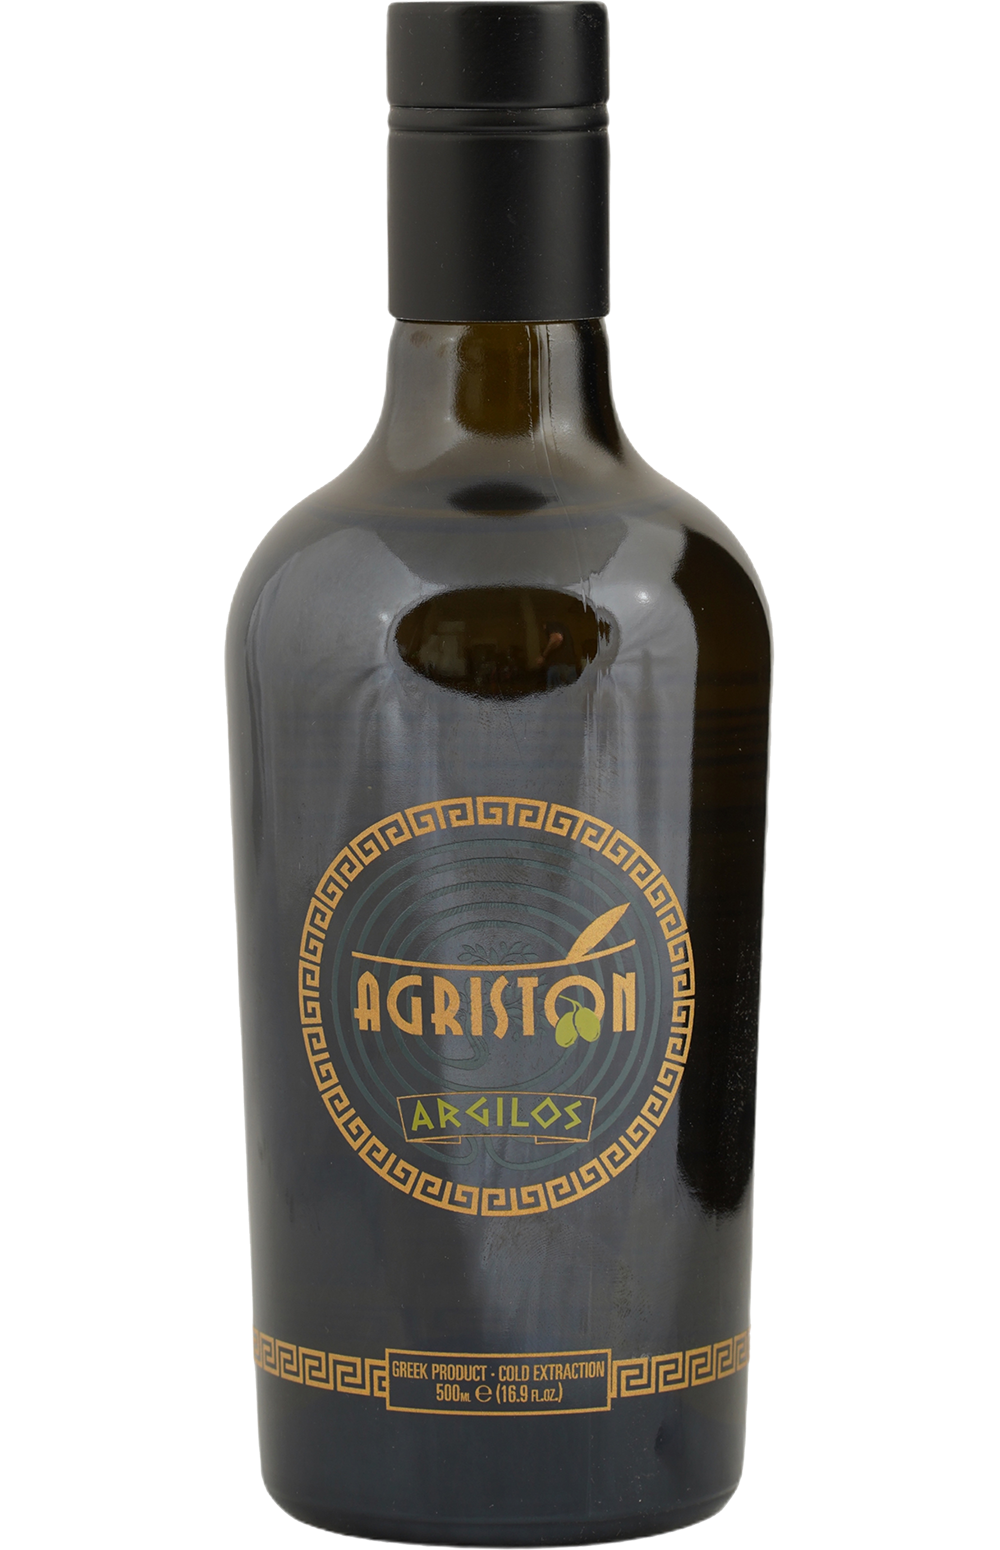 Agriston Argilos